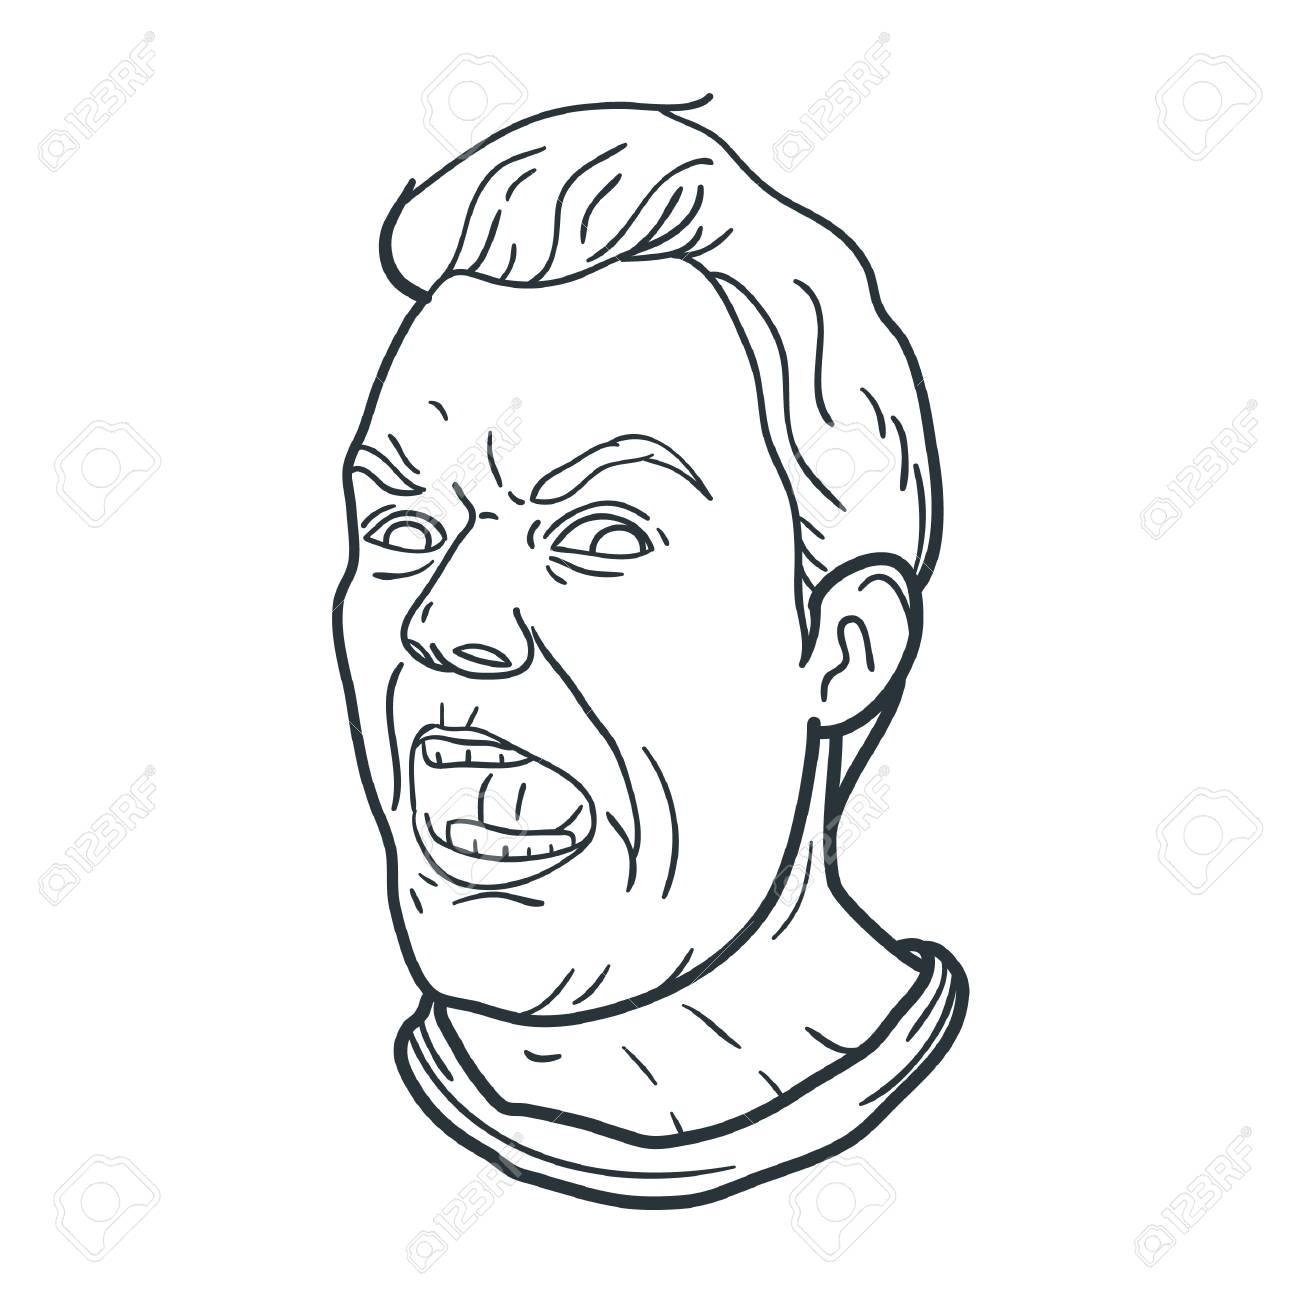 1300x1300 Angry Man Shouting Expression Royalty Free Cliparts, Vectors,